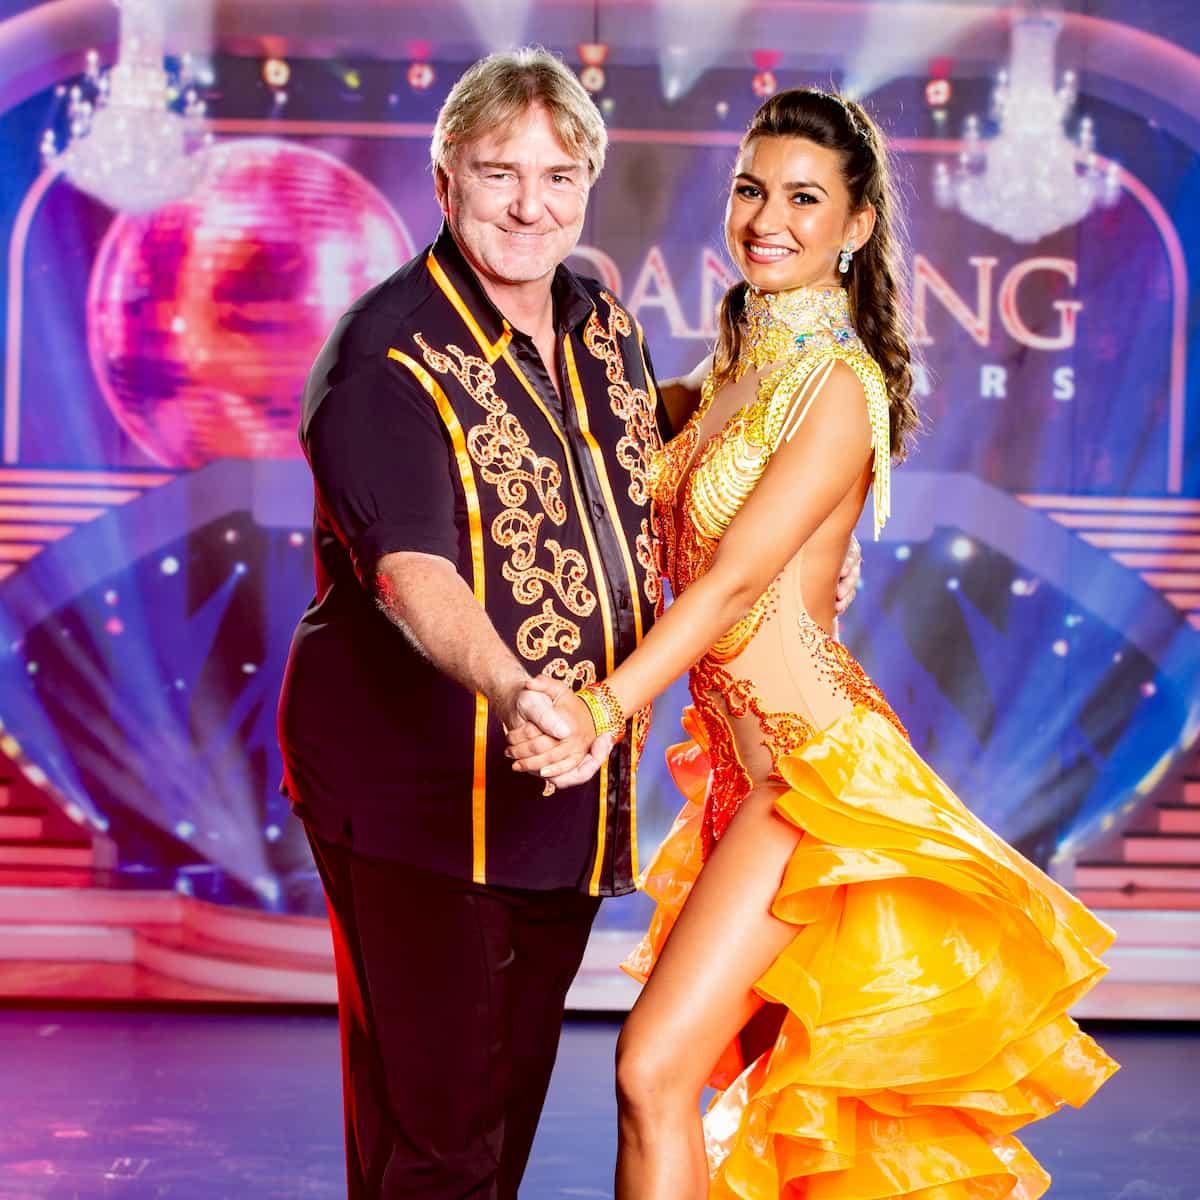 Andreas Ogris und Vesela Dimova - Dancing Stars 25.9.2020